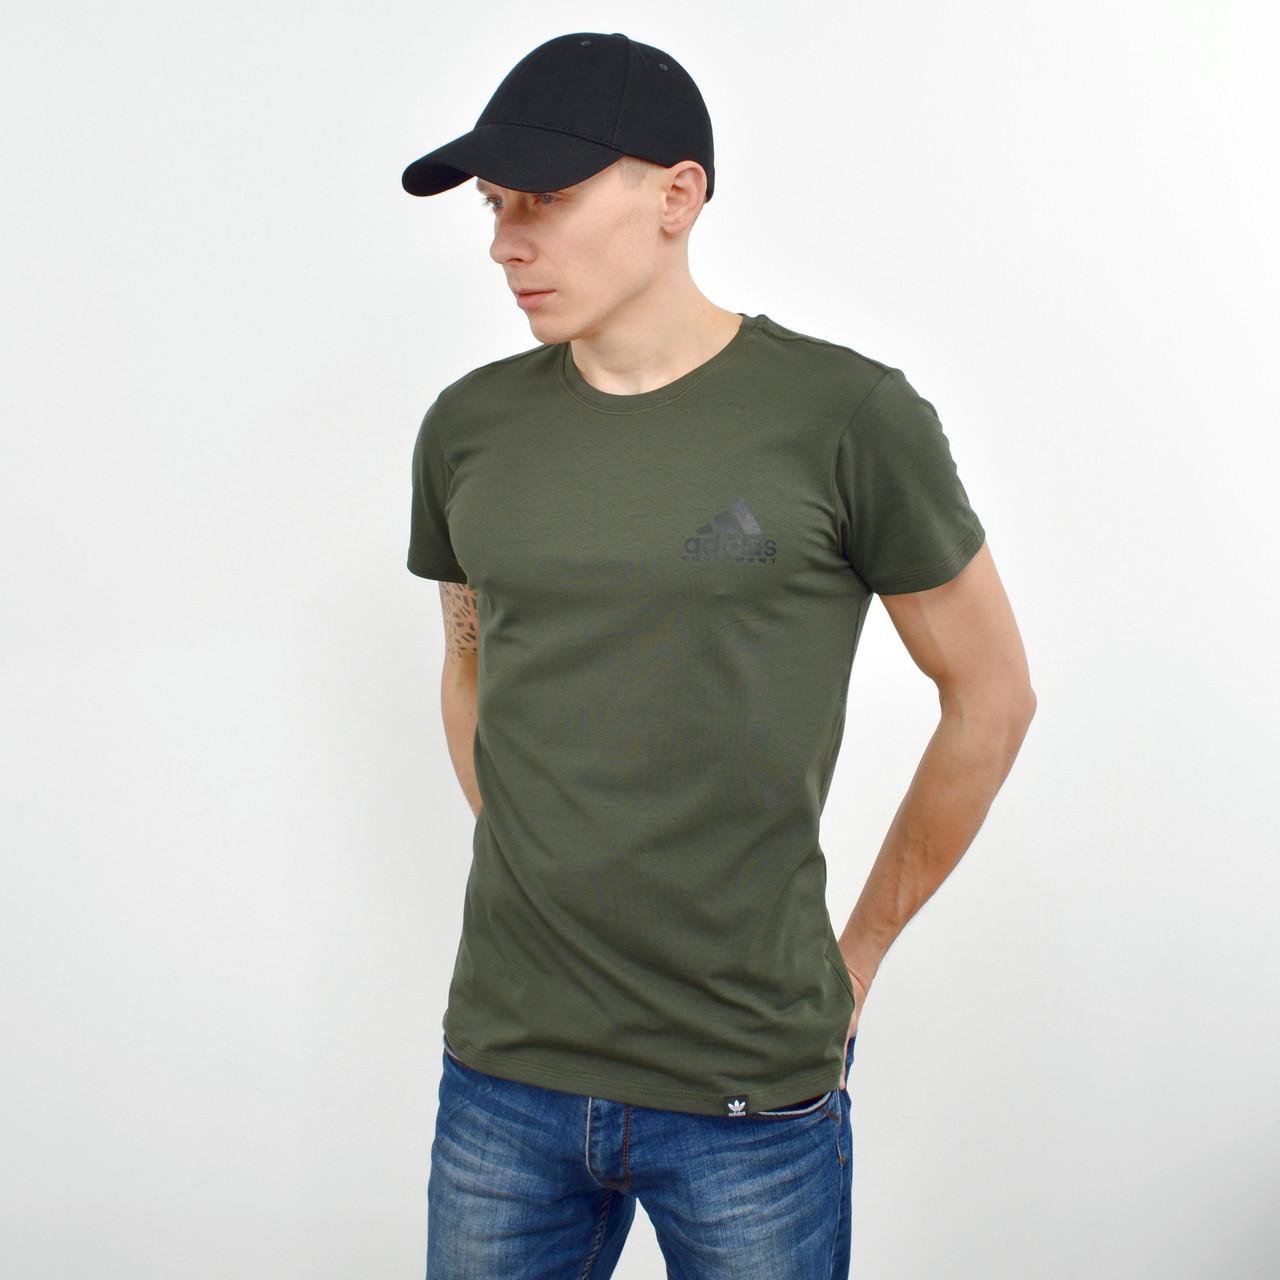 Мужская футболка с накаткой на груди и спине Adidas (реплика) хаки